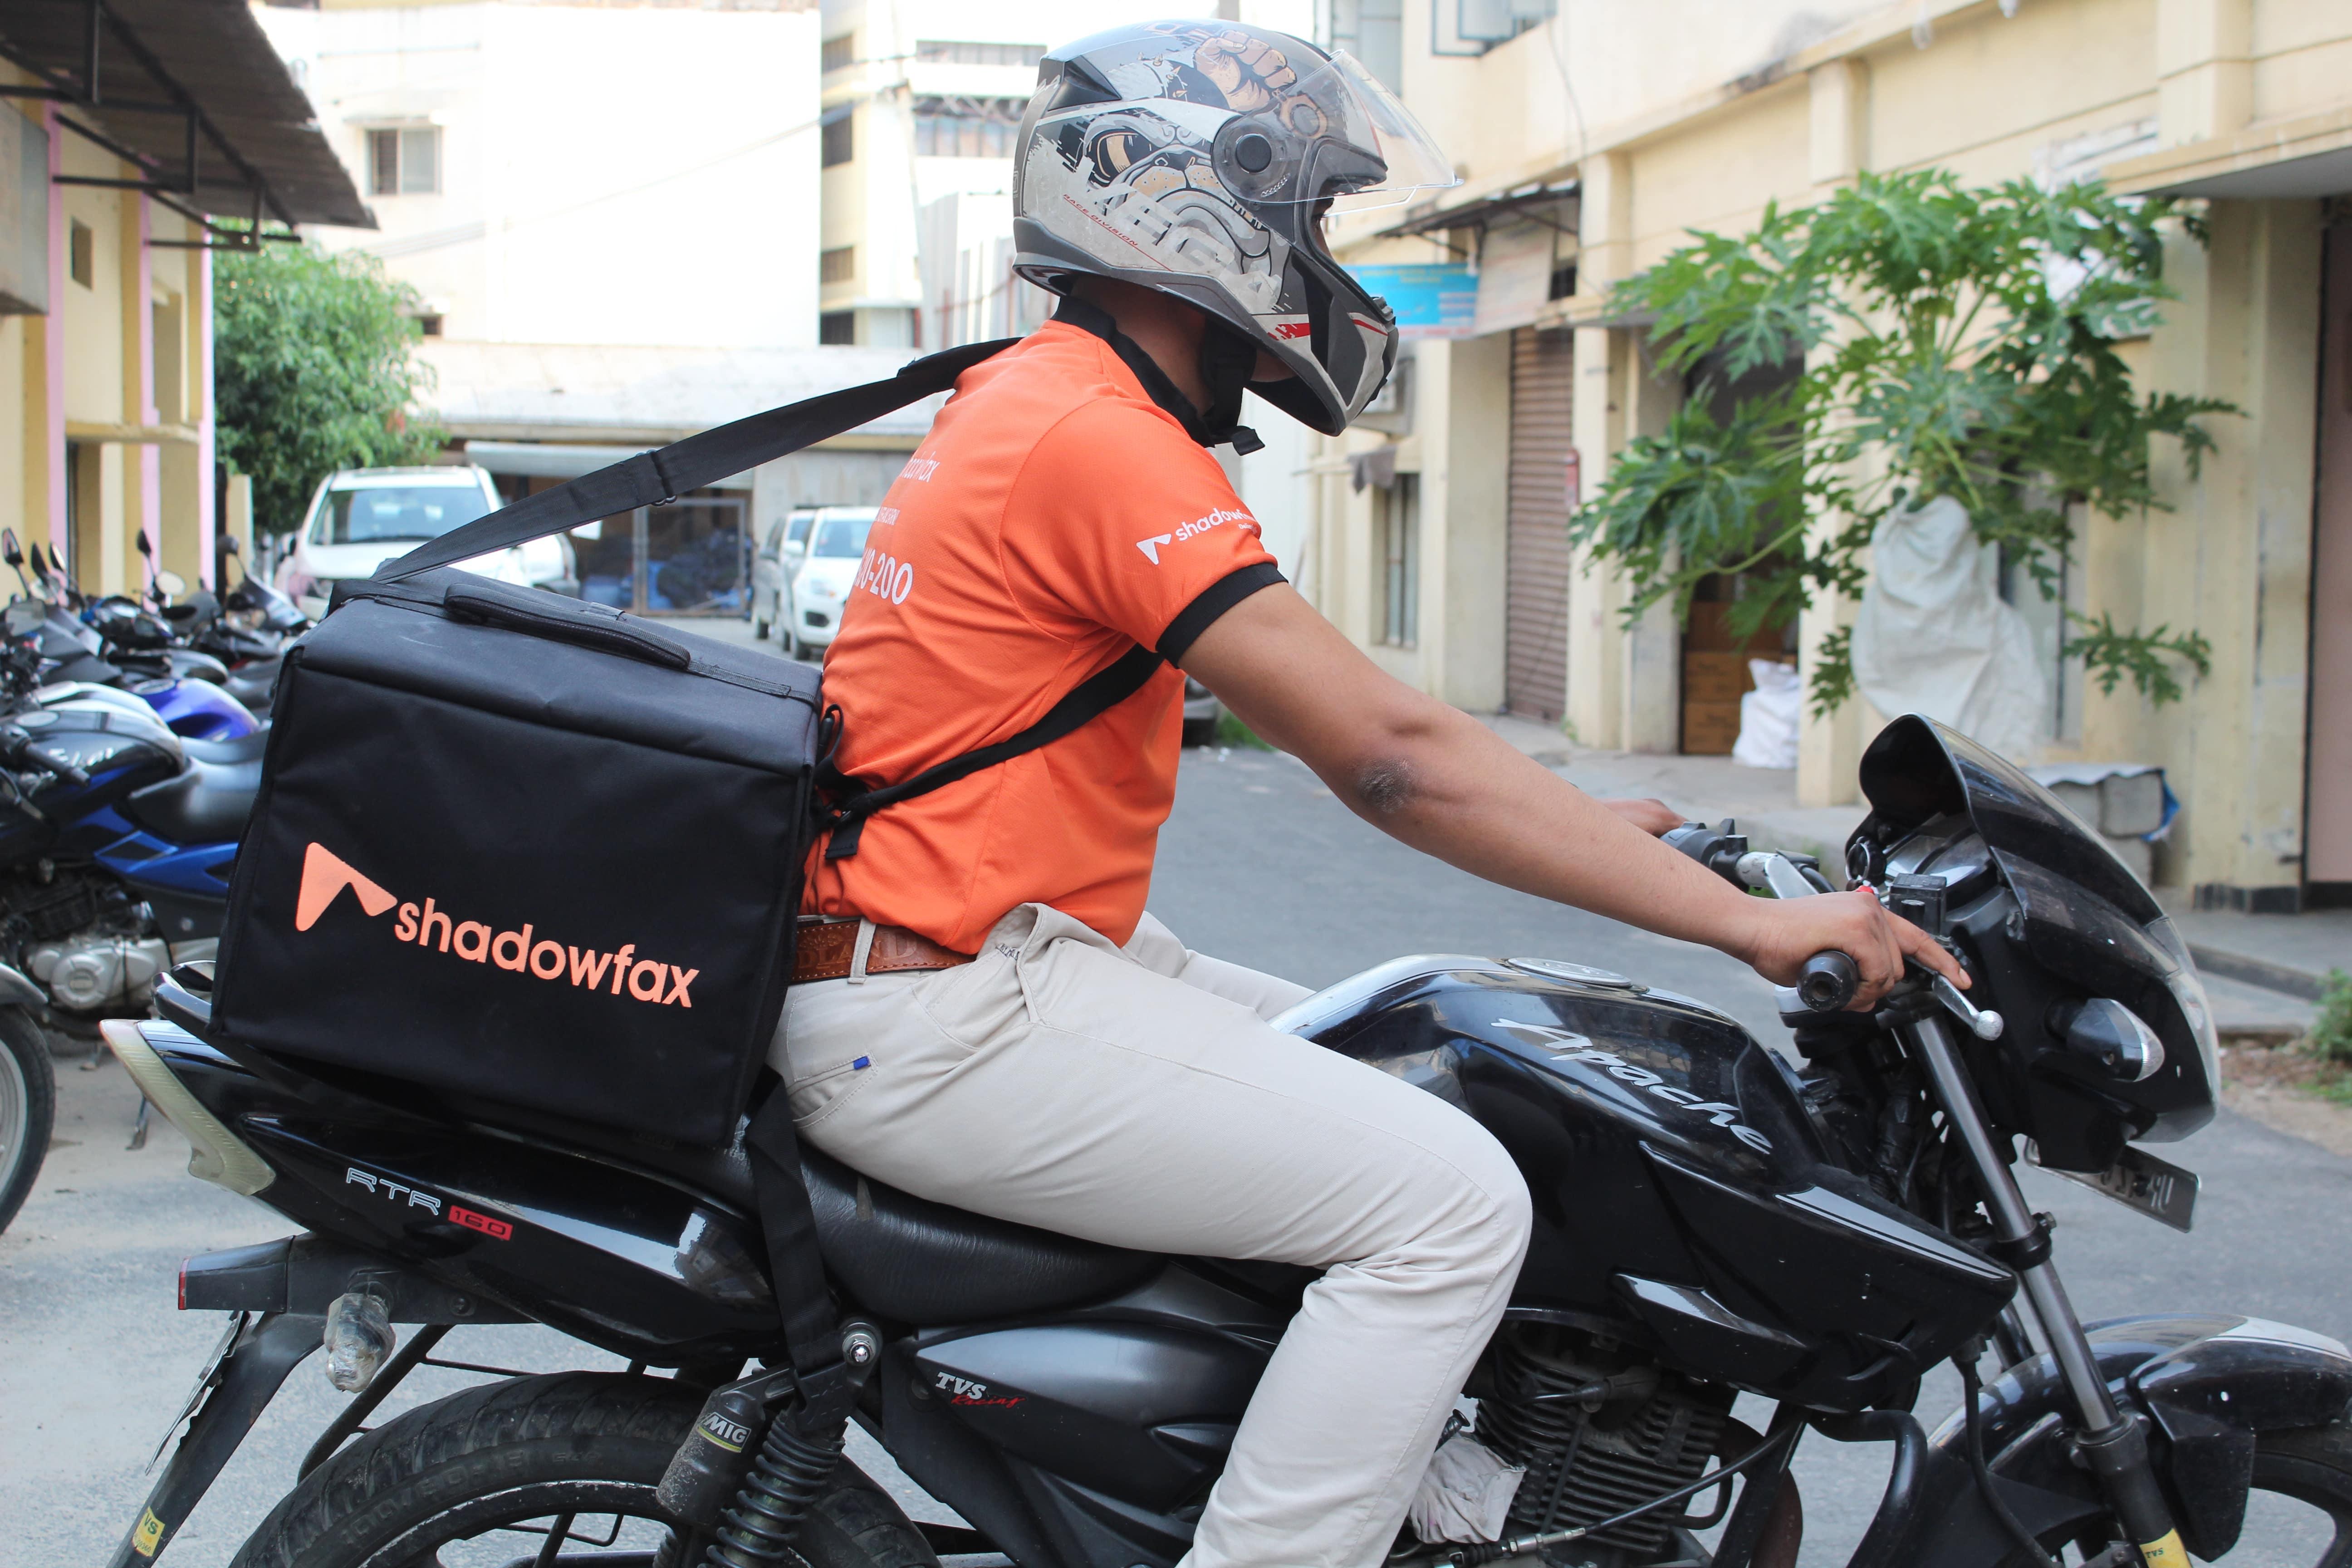 delivery service provider